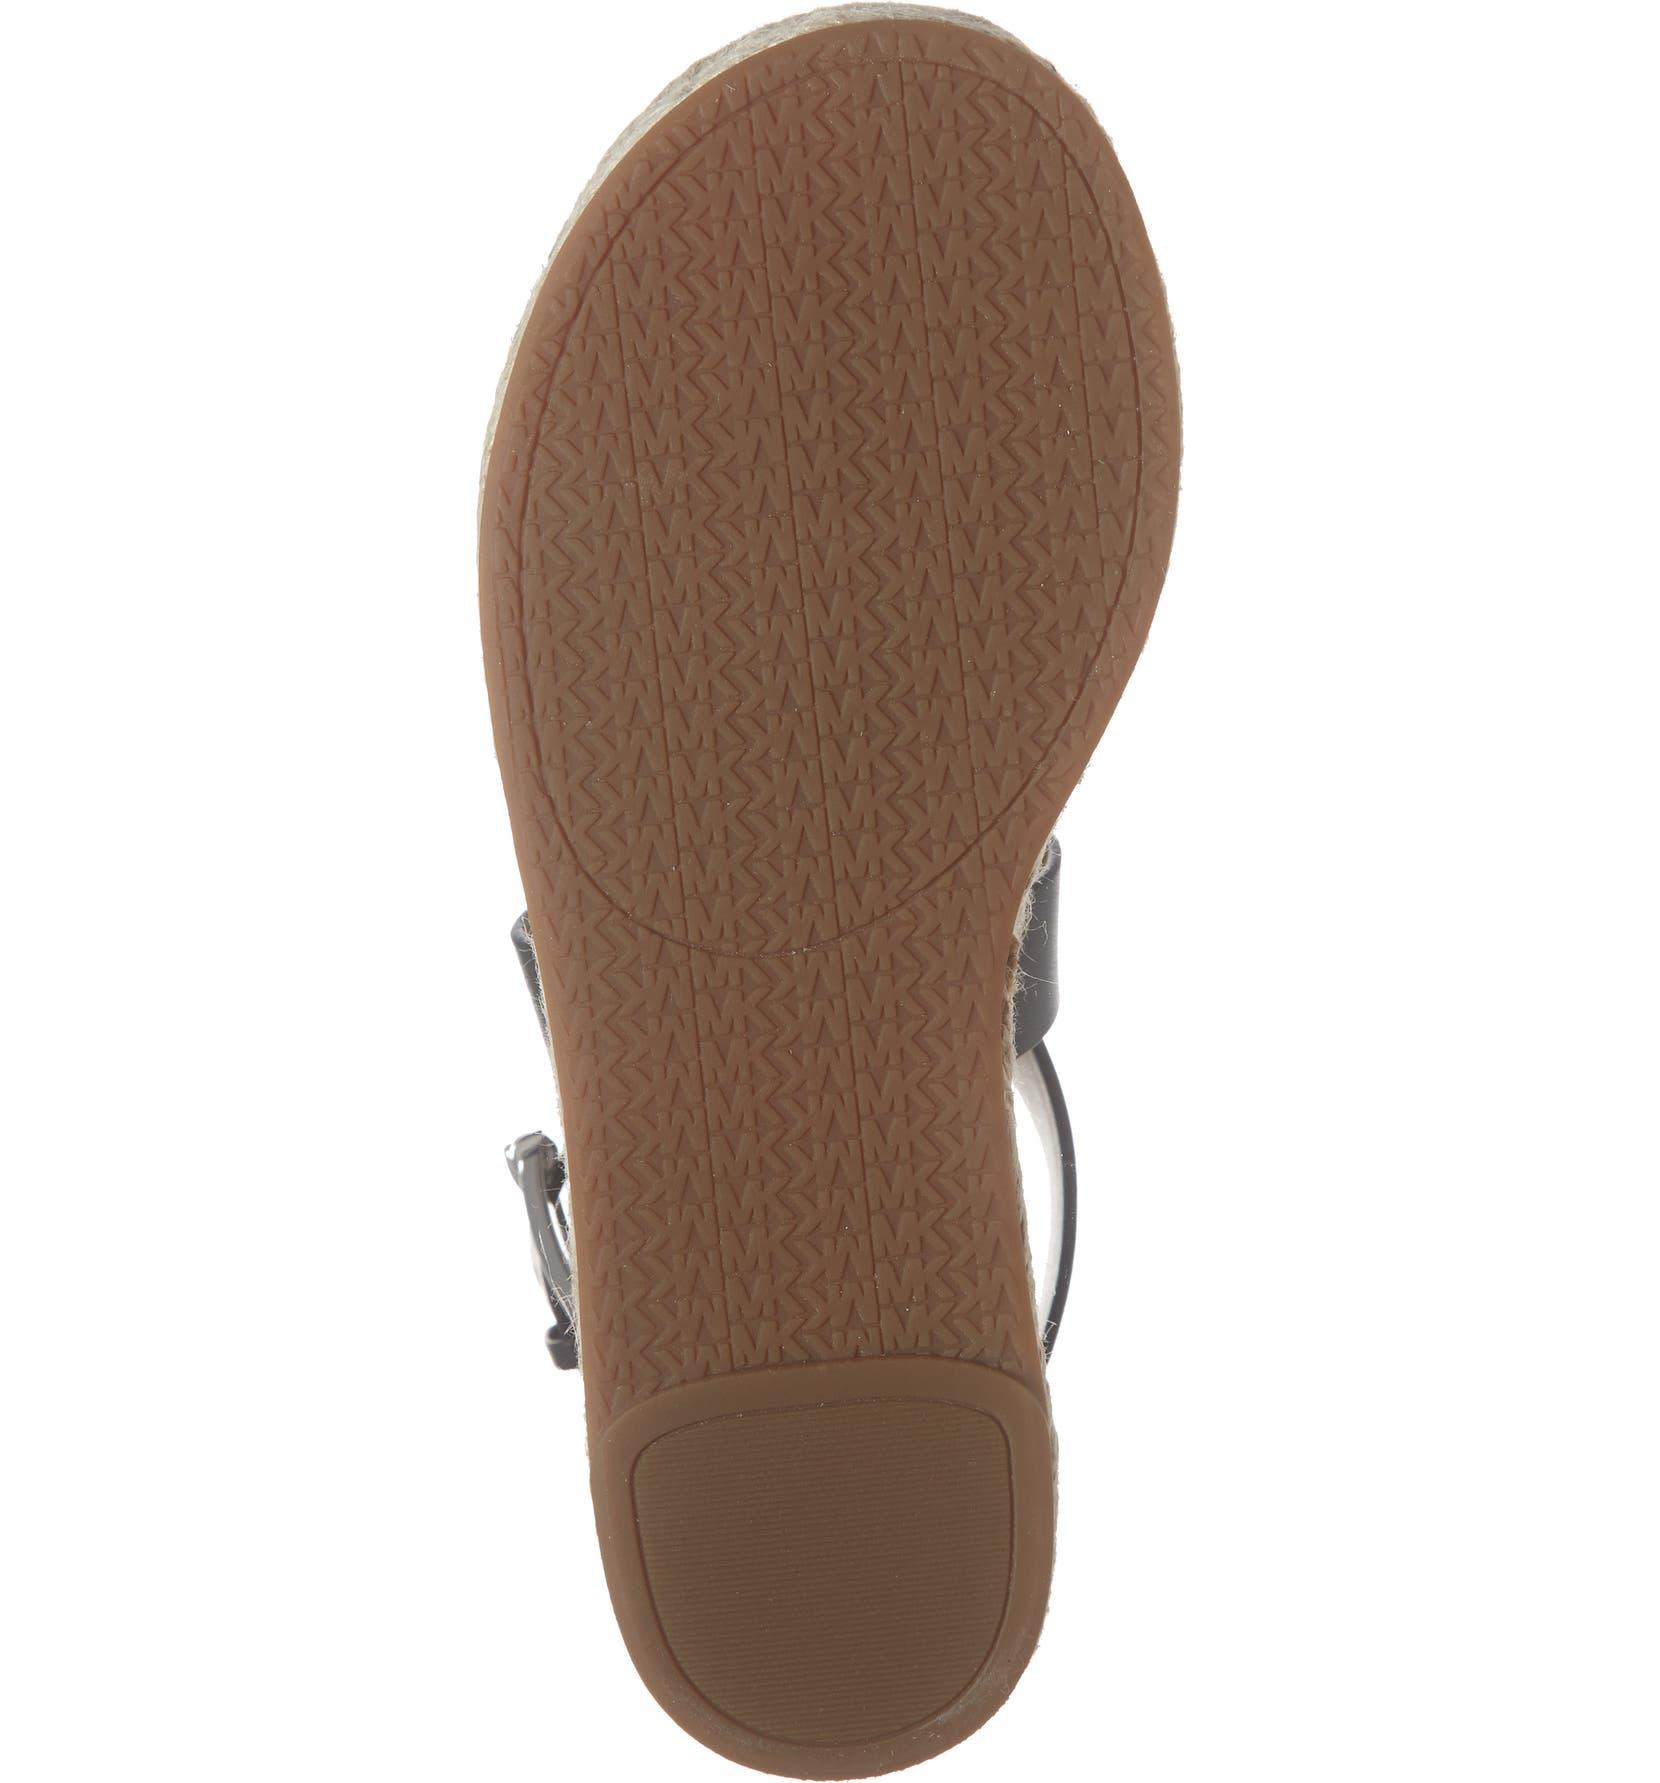 a65db82c0913 MICHAEL Michael Kors  Darby  Crisscross Espadrille Sandal (Women ...